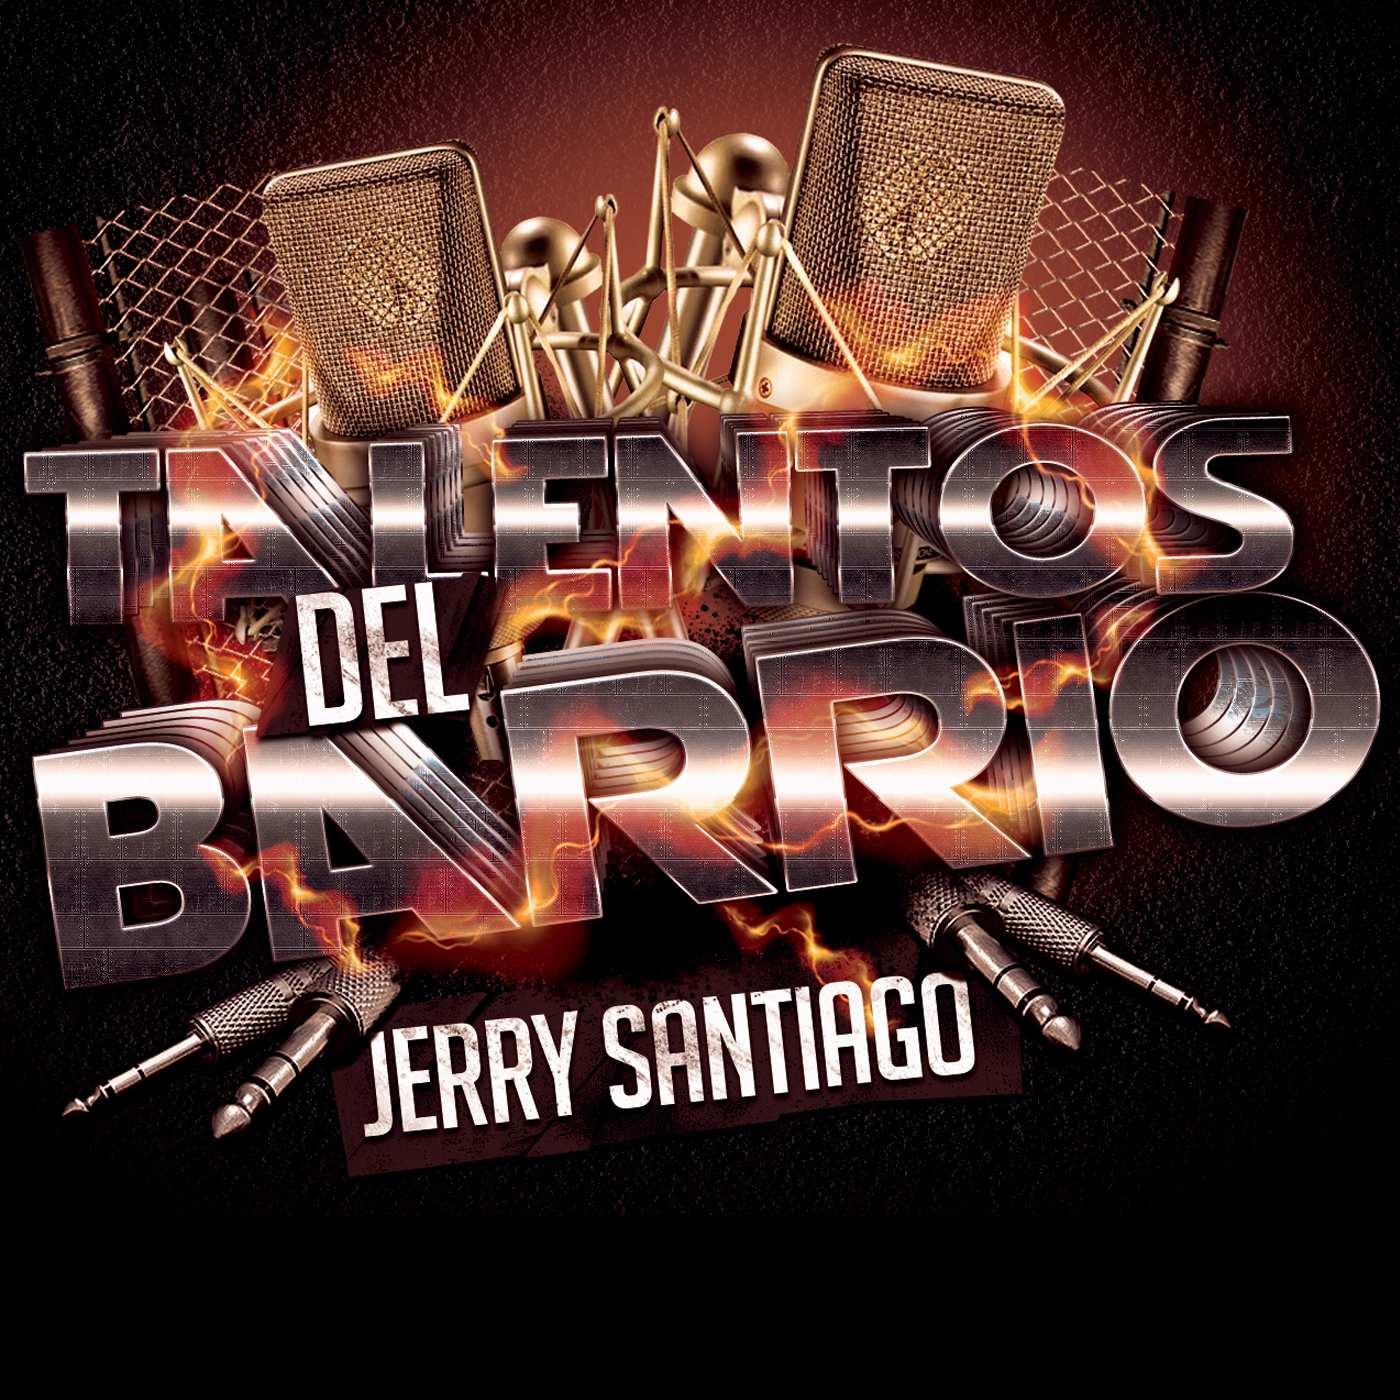 Talentos Del Barrio by Urbana FM